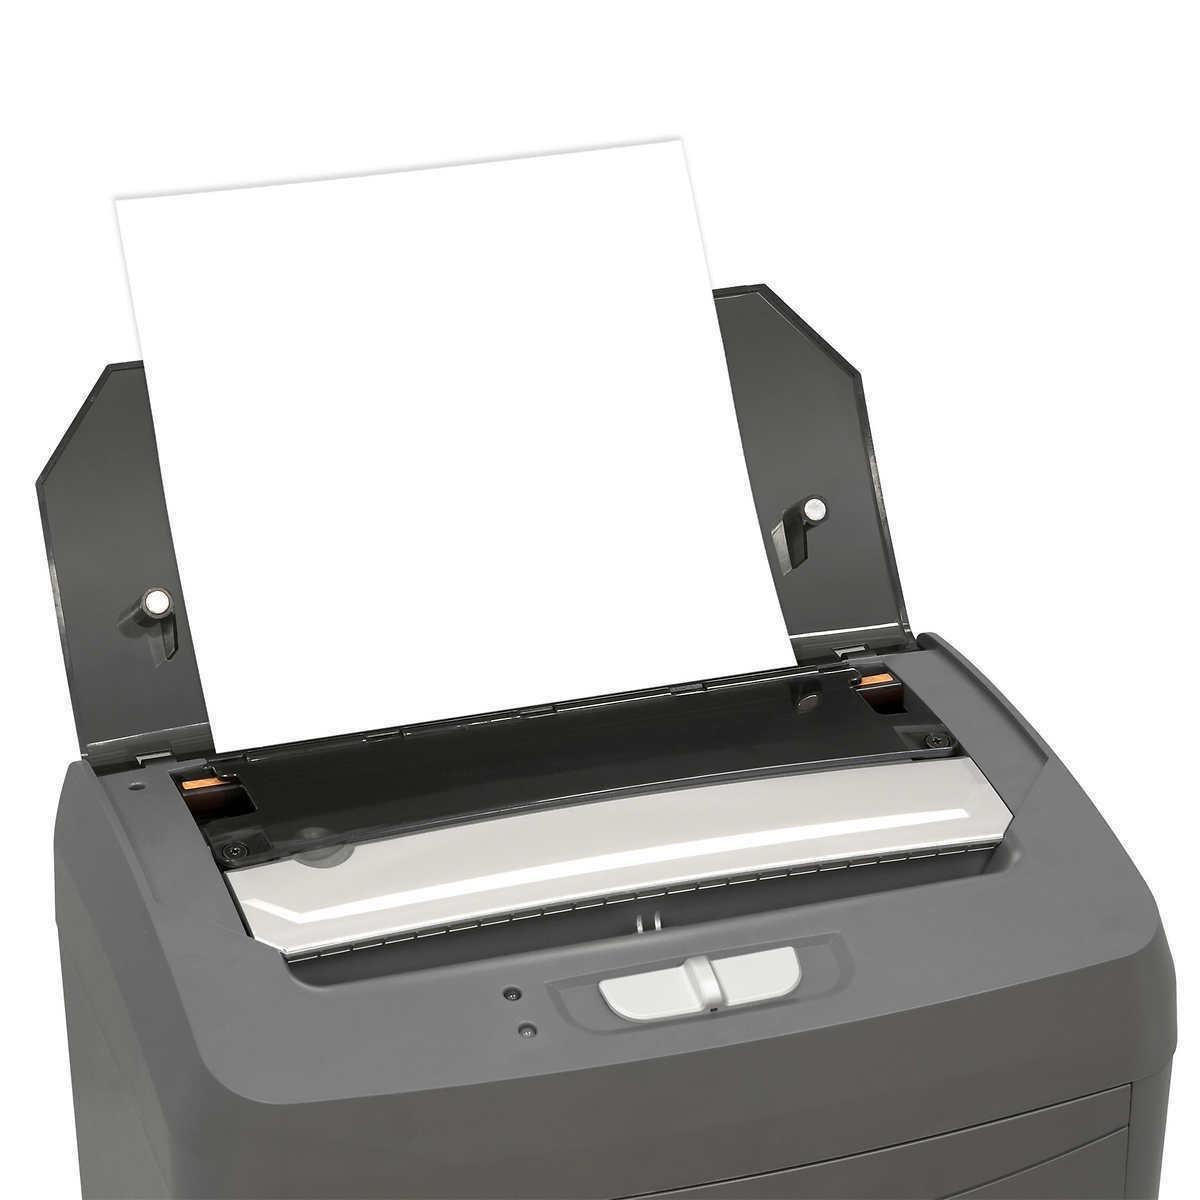 Boxis AutoShred Microcut